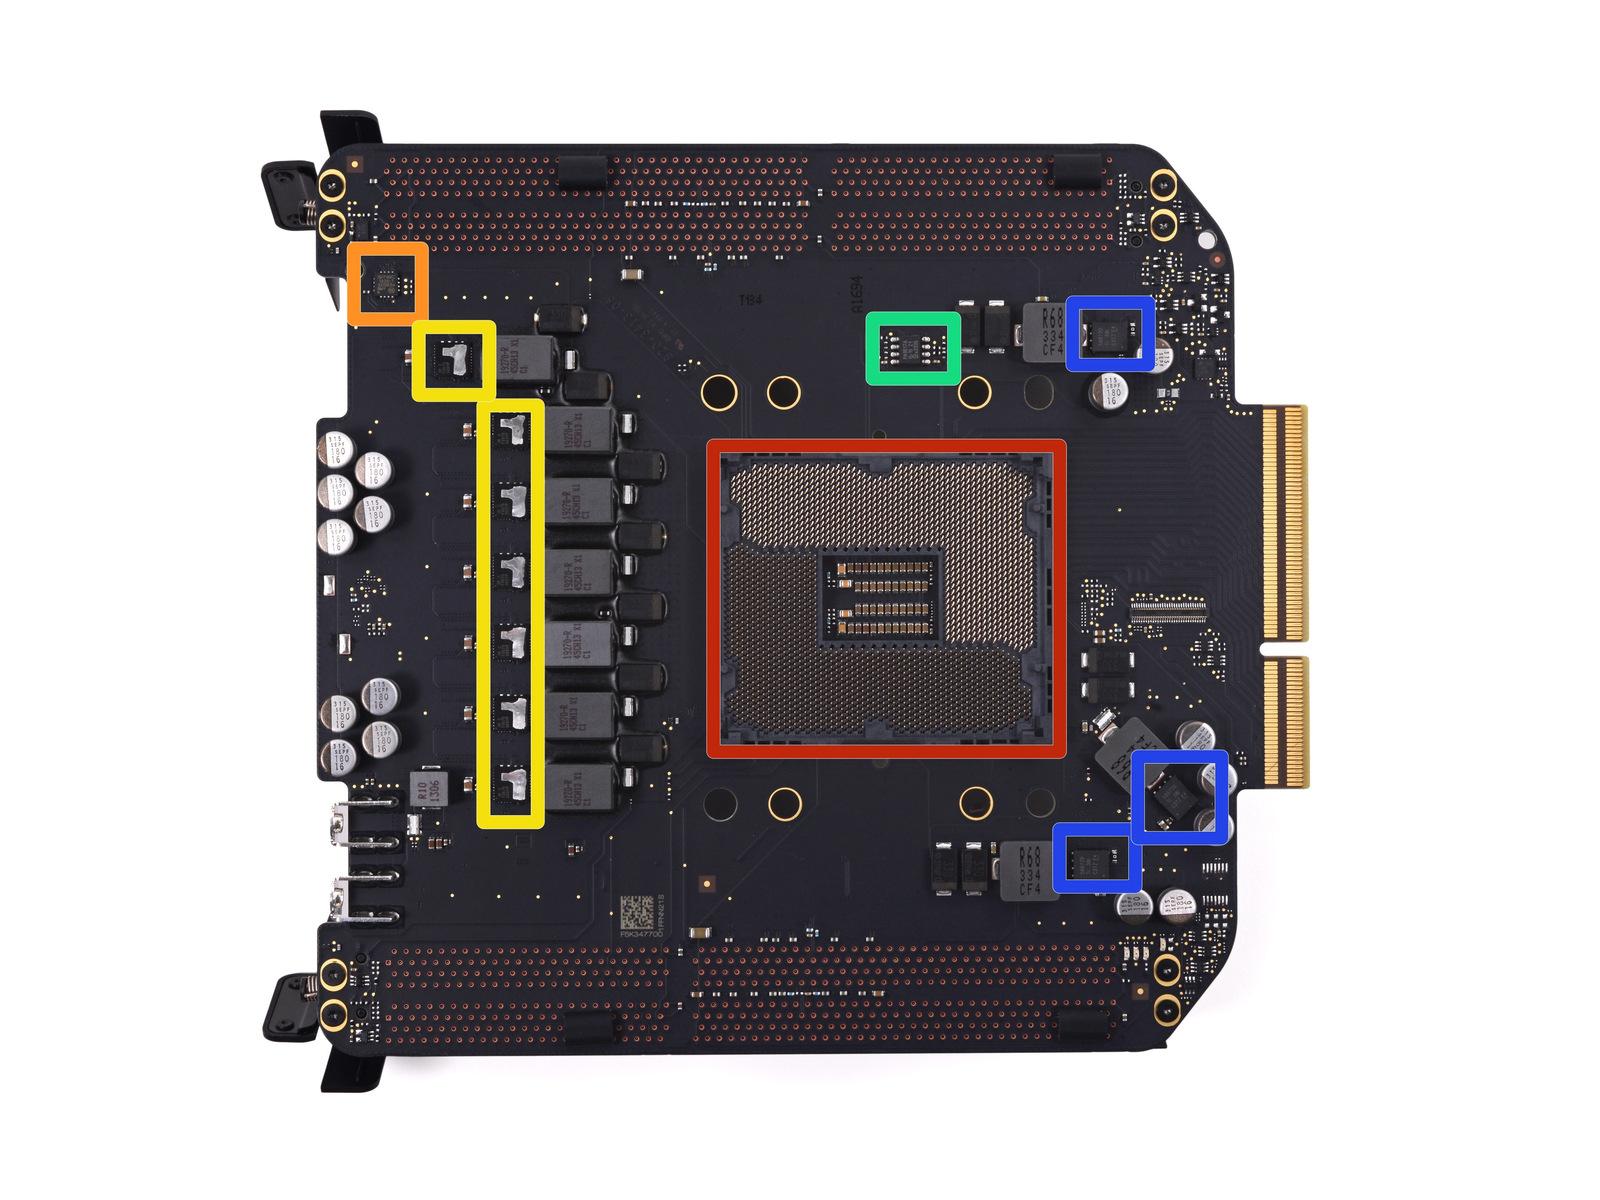 A clearer shot of the Mac Pro's LGA 2011 CPU socket.